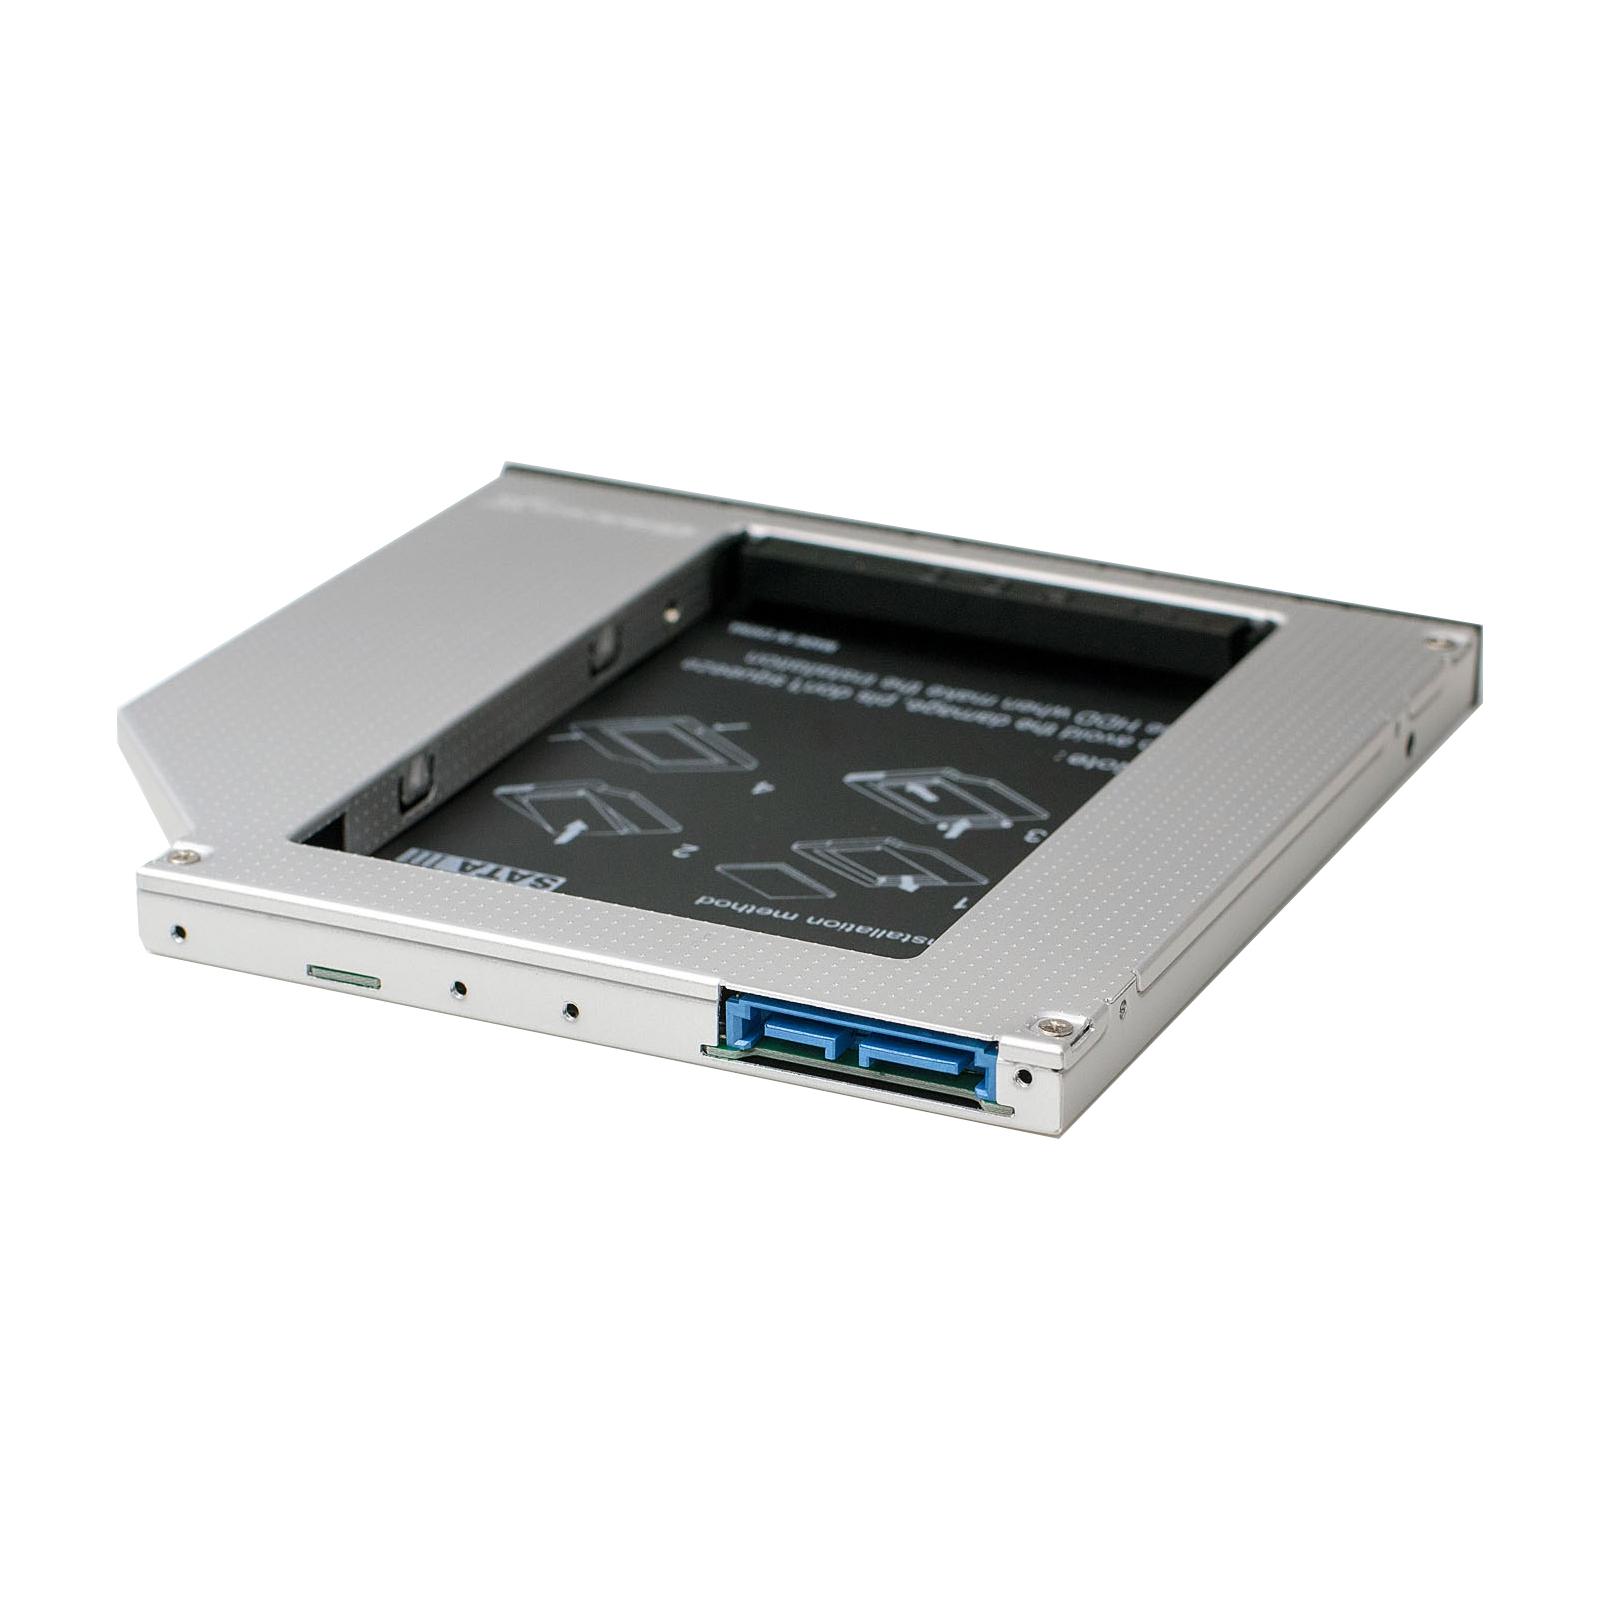 Фрейм-переходник Grand-X HDD 2.5'' to notebook 9.5 mm ODD SATA3 (HDC-26) изображение 2